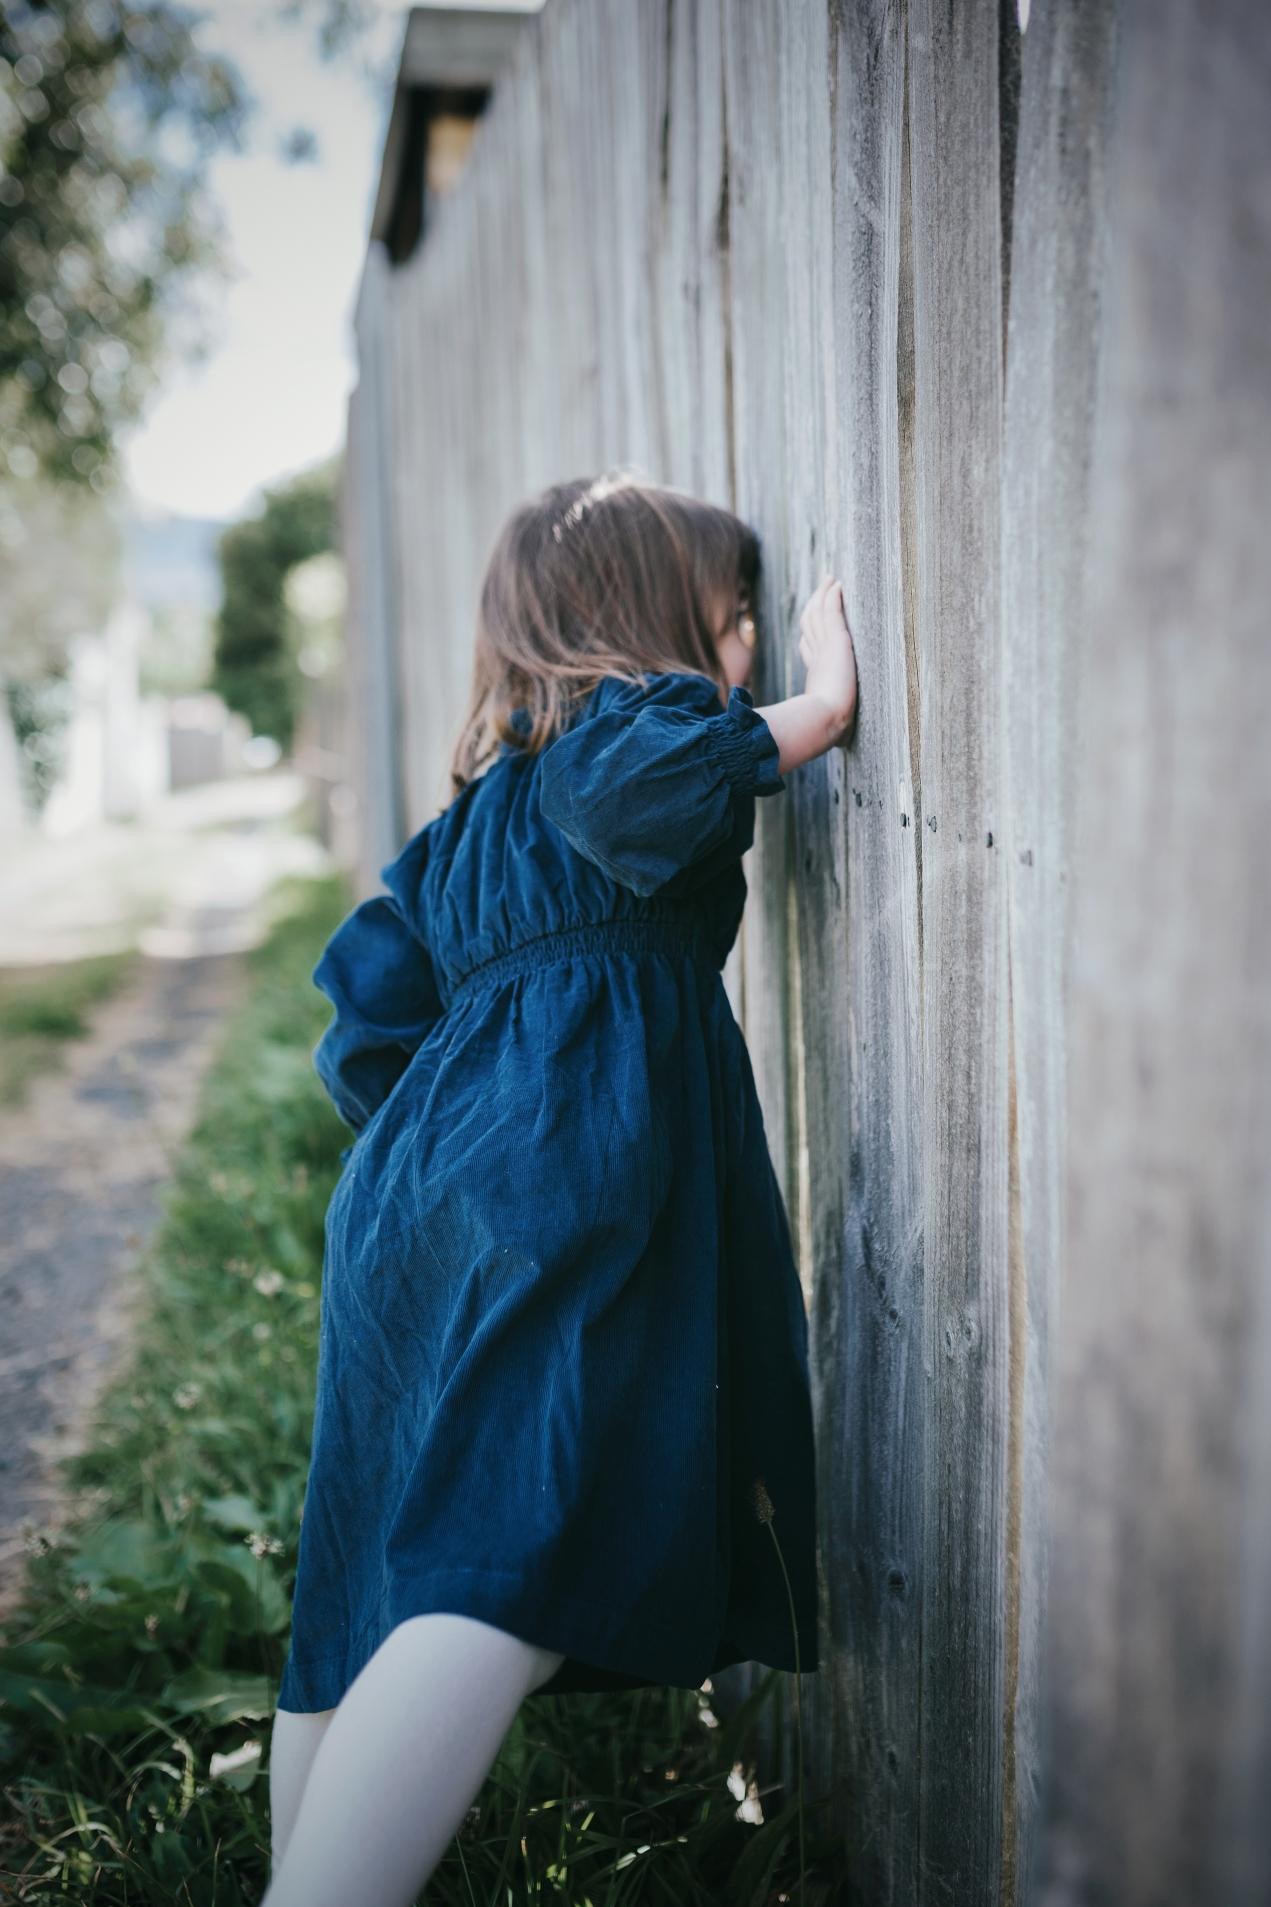 winter-dress-kids-fashion-photography-siida-hobart-peggy.jpg